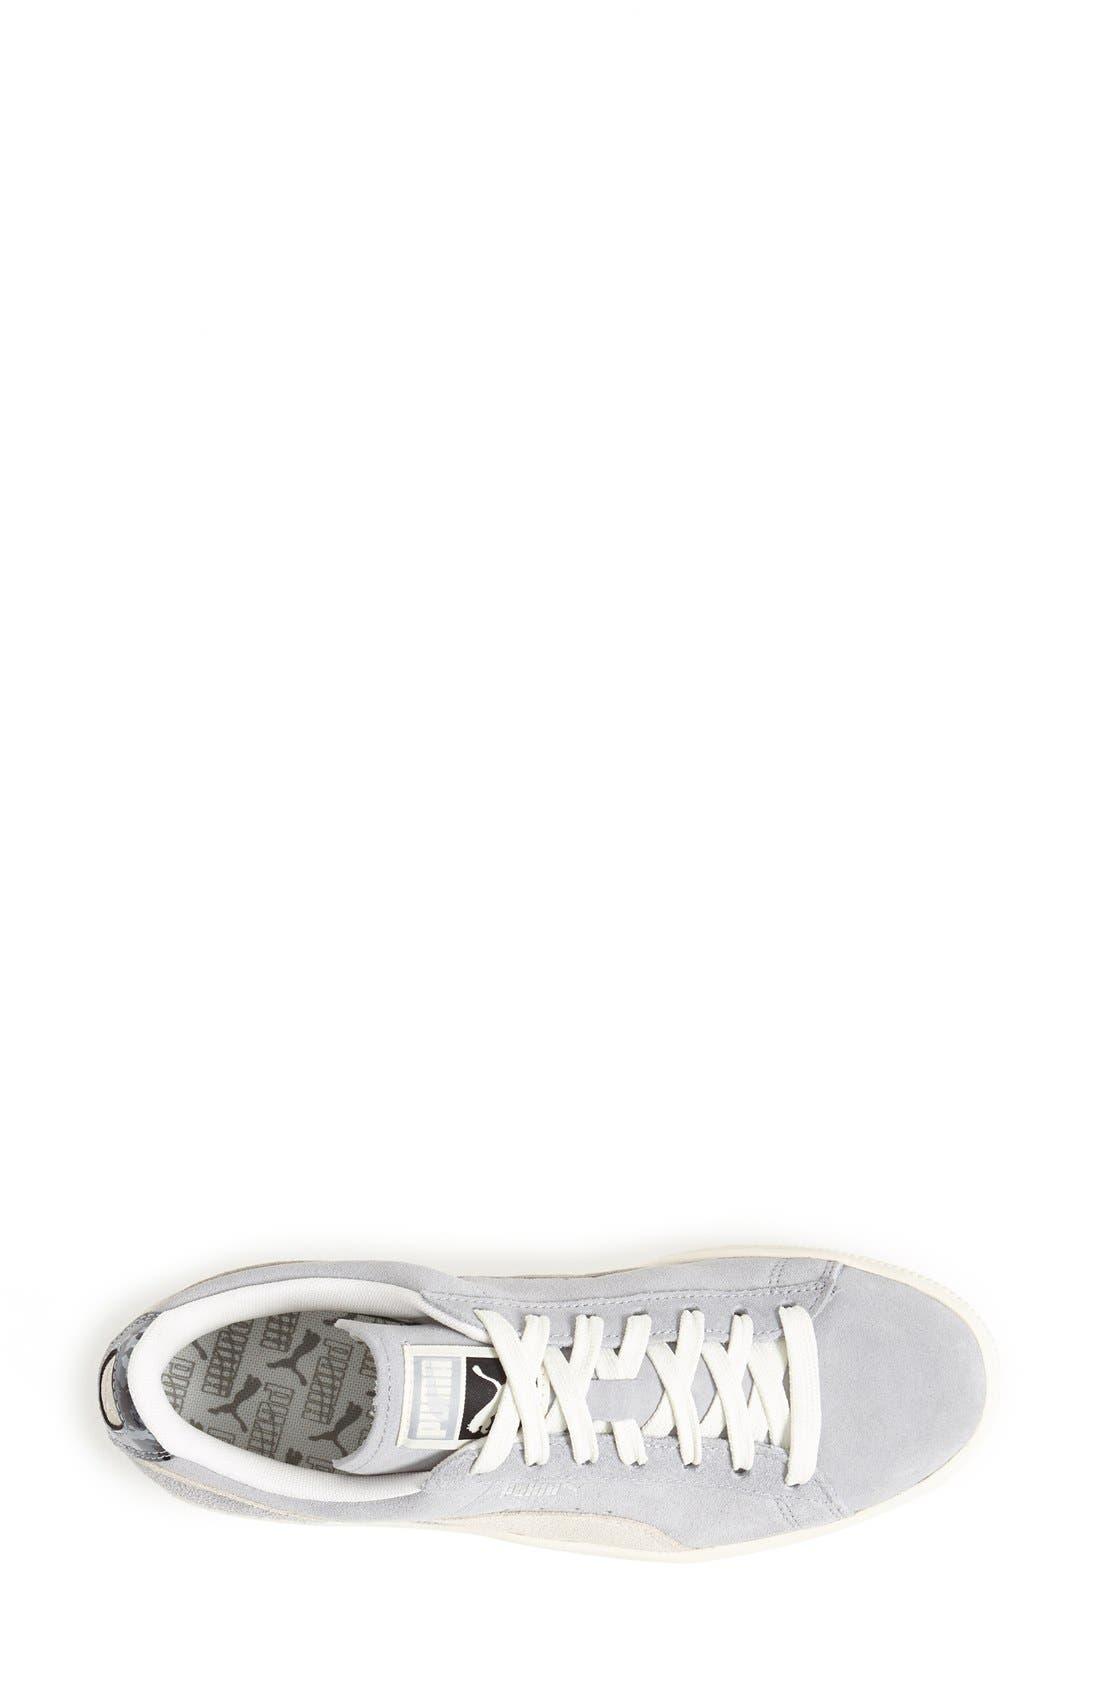 Alternate Image 3  - PUMA 'Classic' Suede Sneaker (Women)